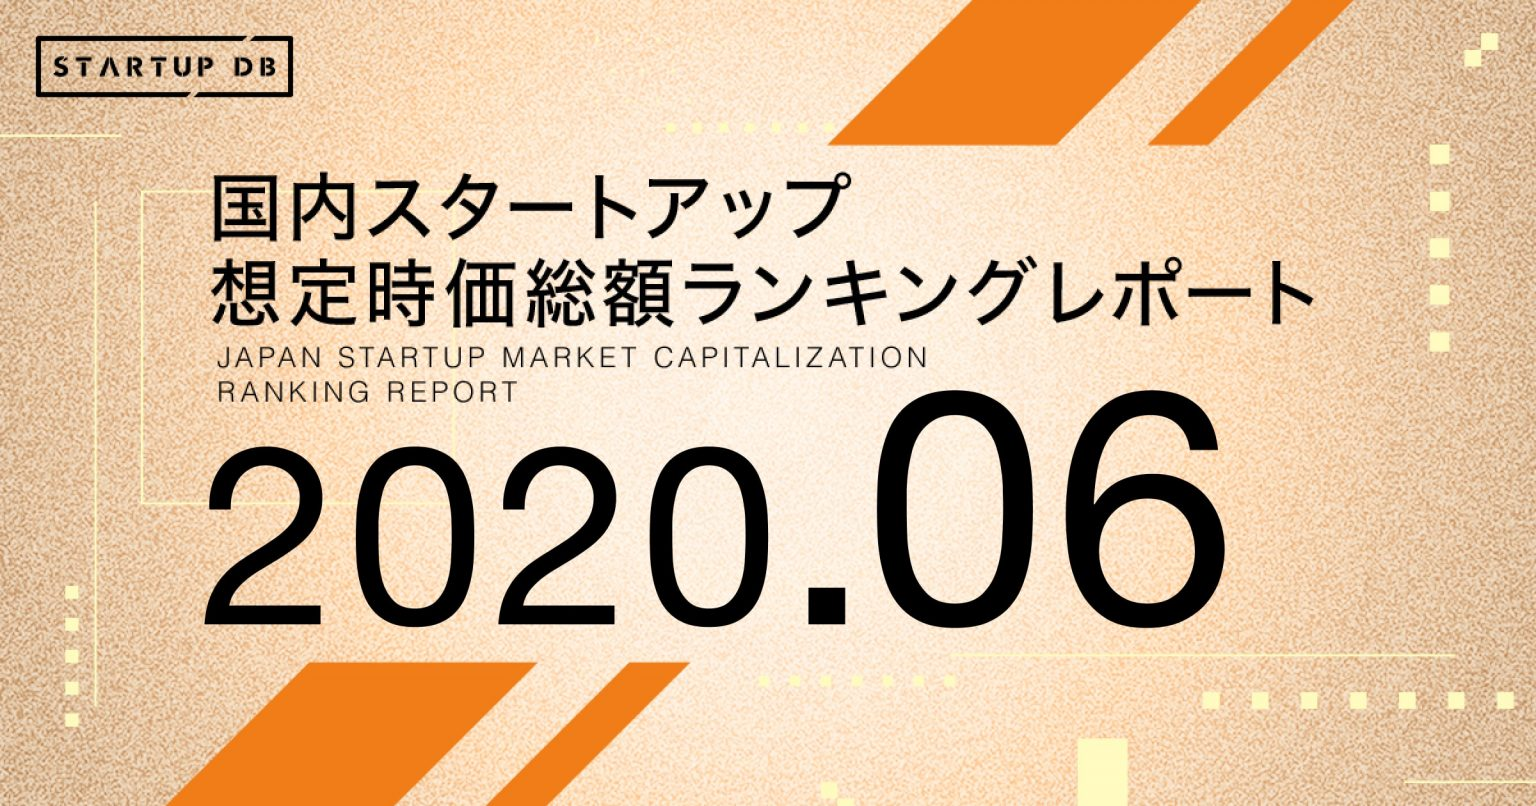 【STARTUP DB】調査結果 国内スタートアップ想定時価総額ランキング(2020年6月) 時価総額ランキングの変動はなし。累計資金調達額ではPaidyが首位